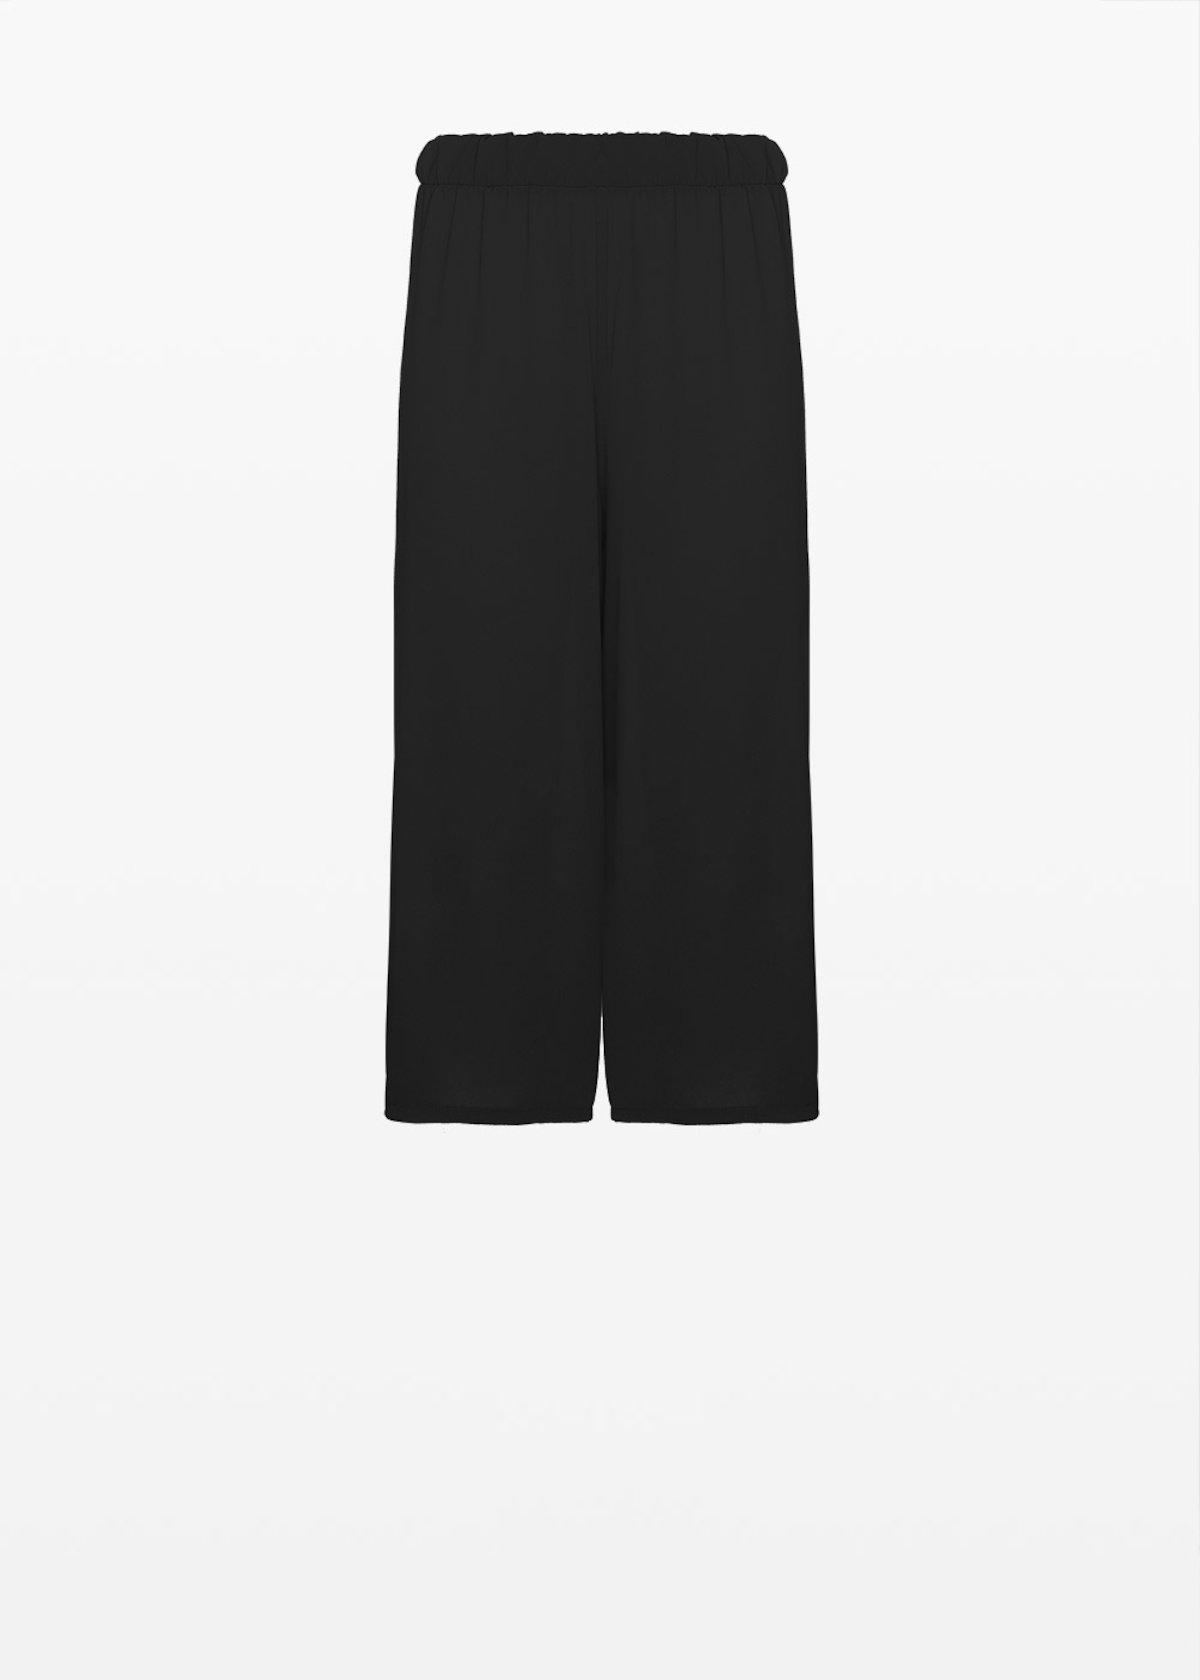 Hammered crepe Peleo trousers with elastic waist - Black - Woman